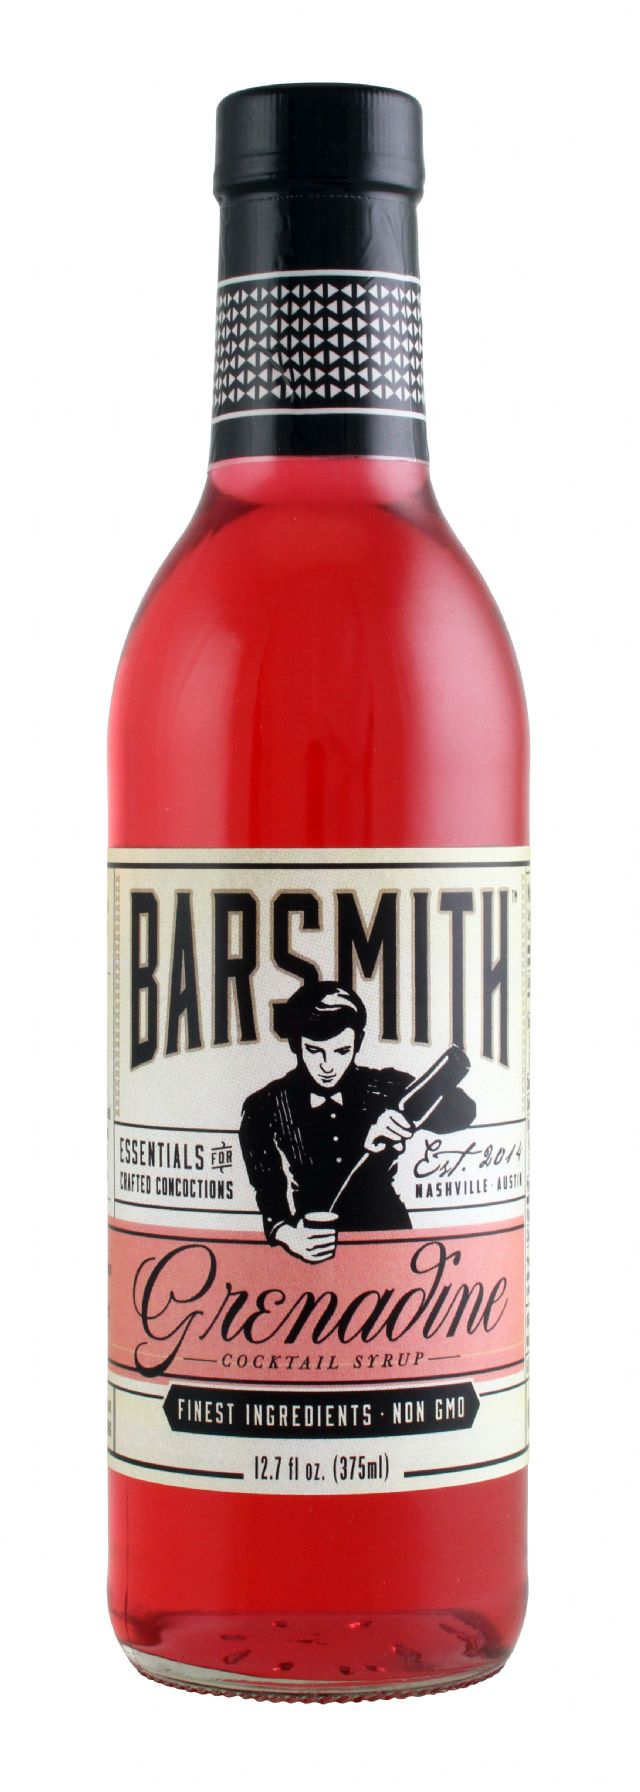 Barsmith: BarSmith Gren Front